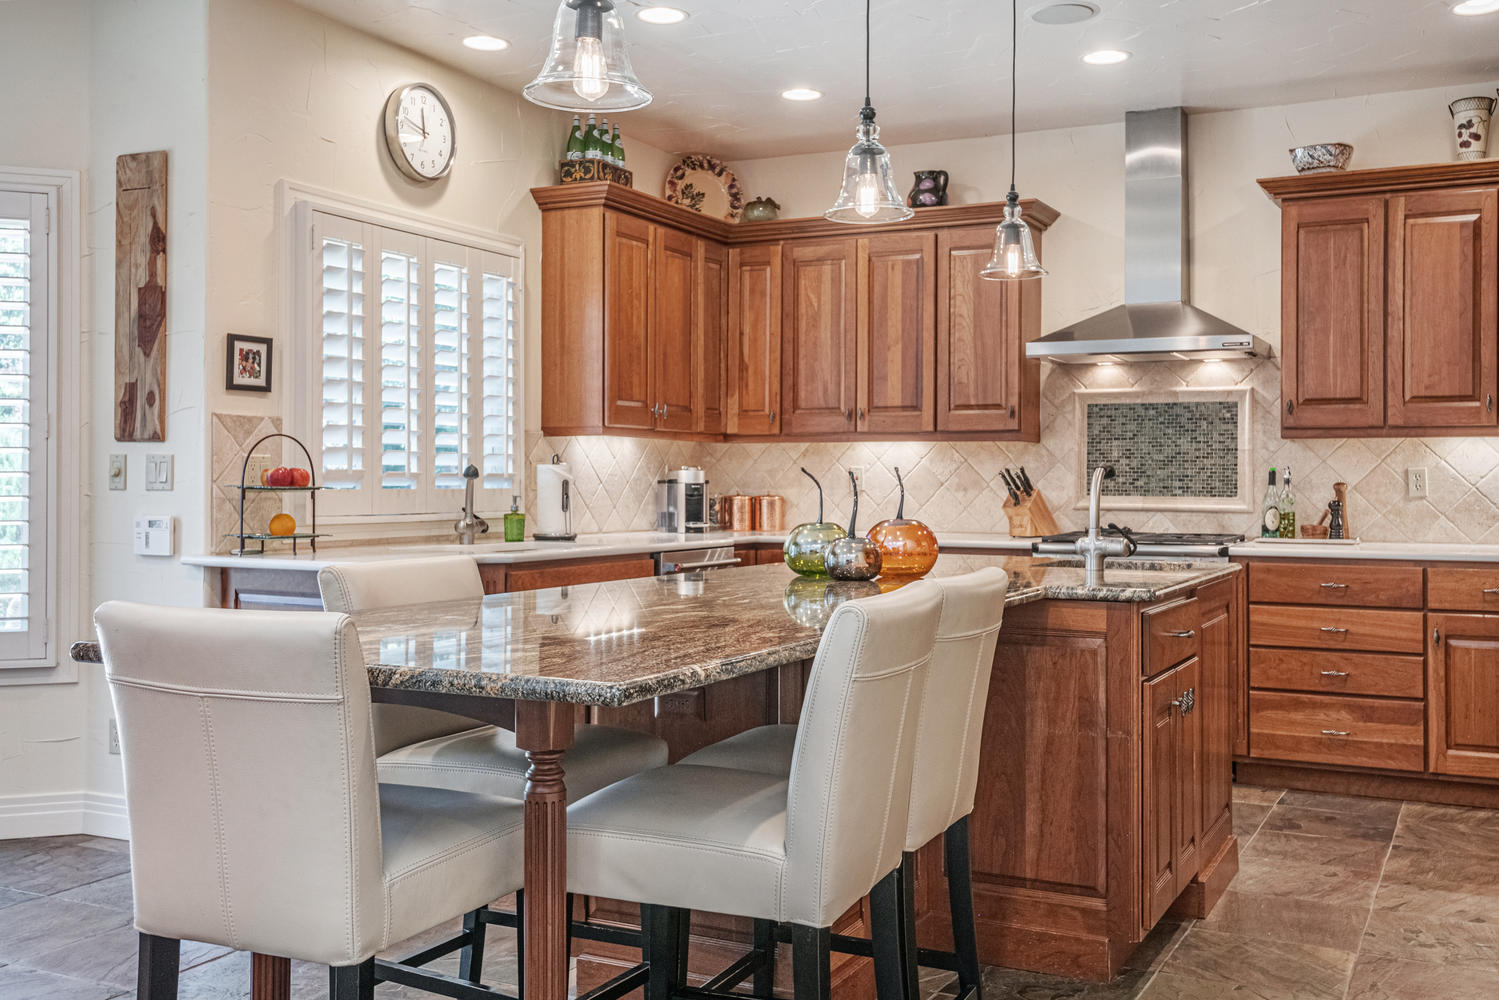 Imagine Yourself in This Wonderful Gourmet Kitchen